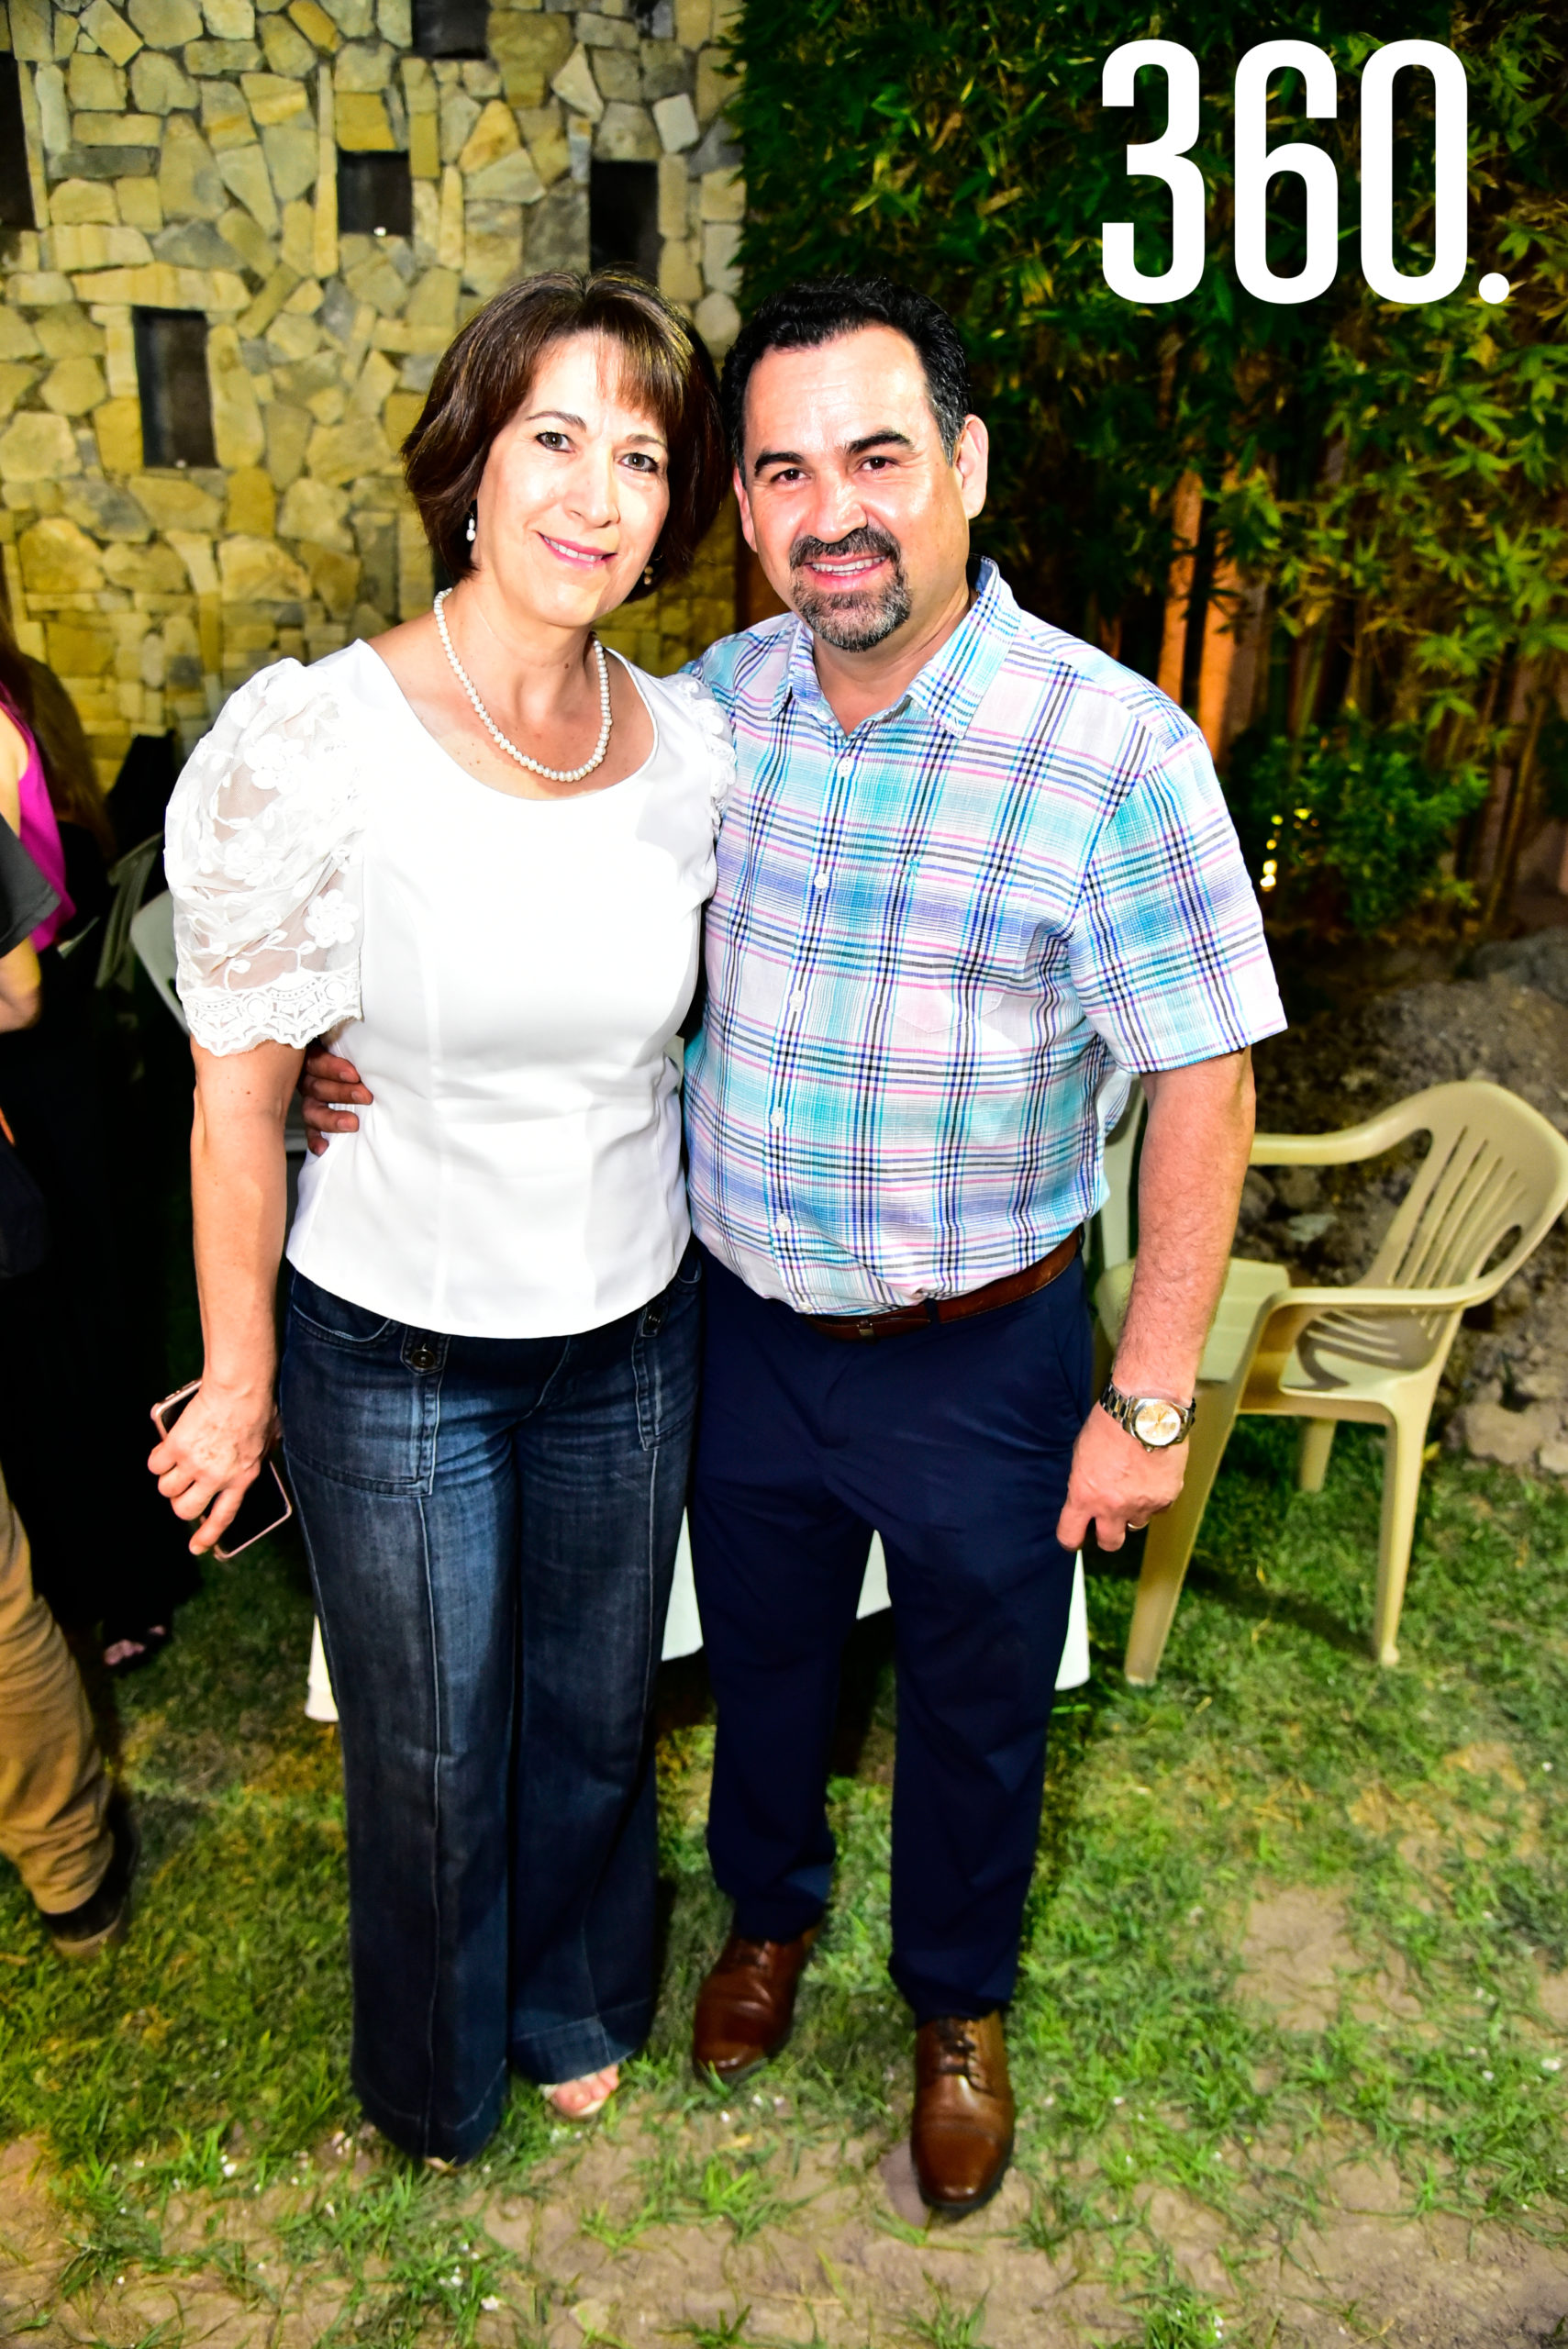 Lourdes Ochoa y Heriberto Oyervides.